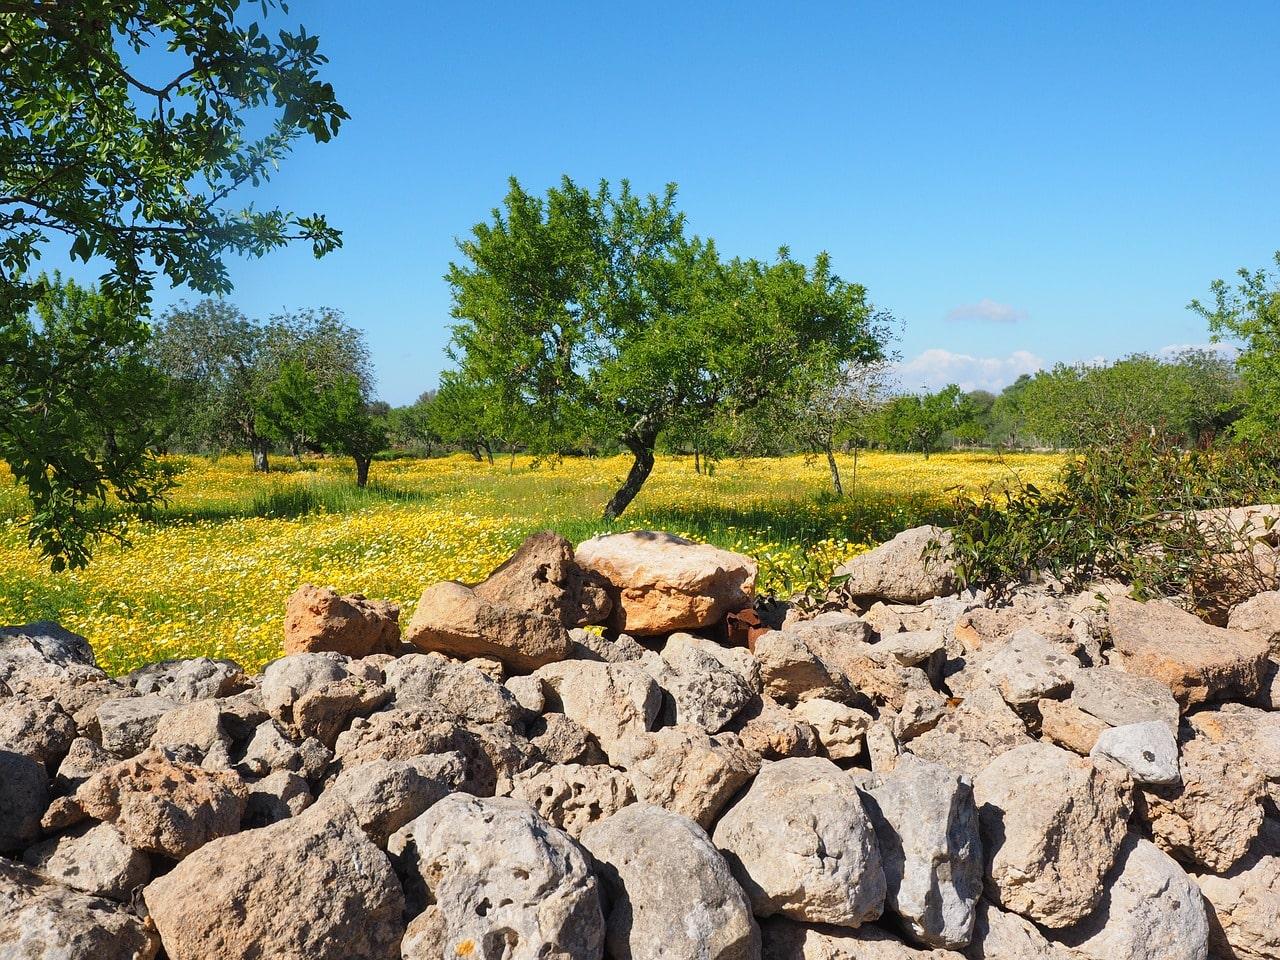 olive-tree-mallorca-spain-orchards-near-me